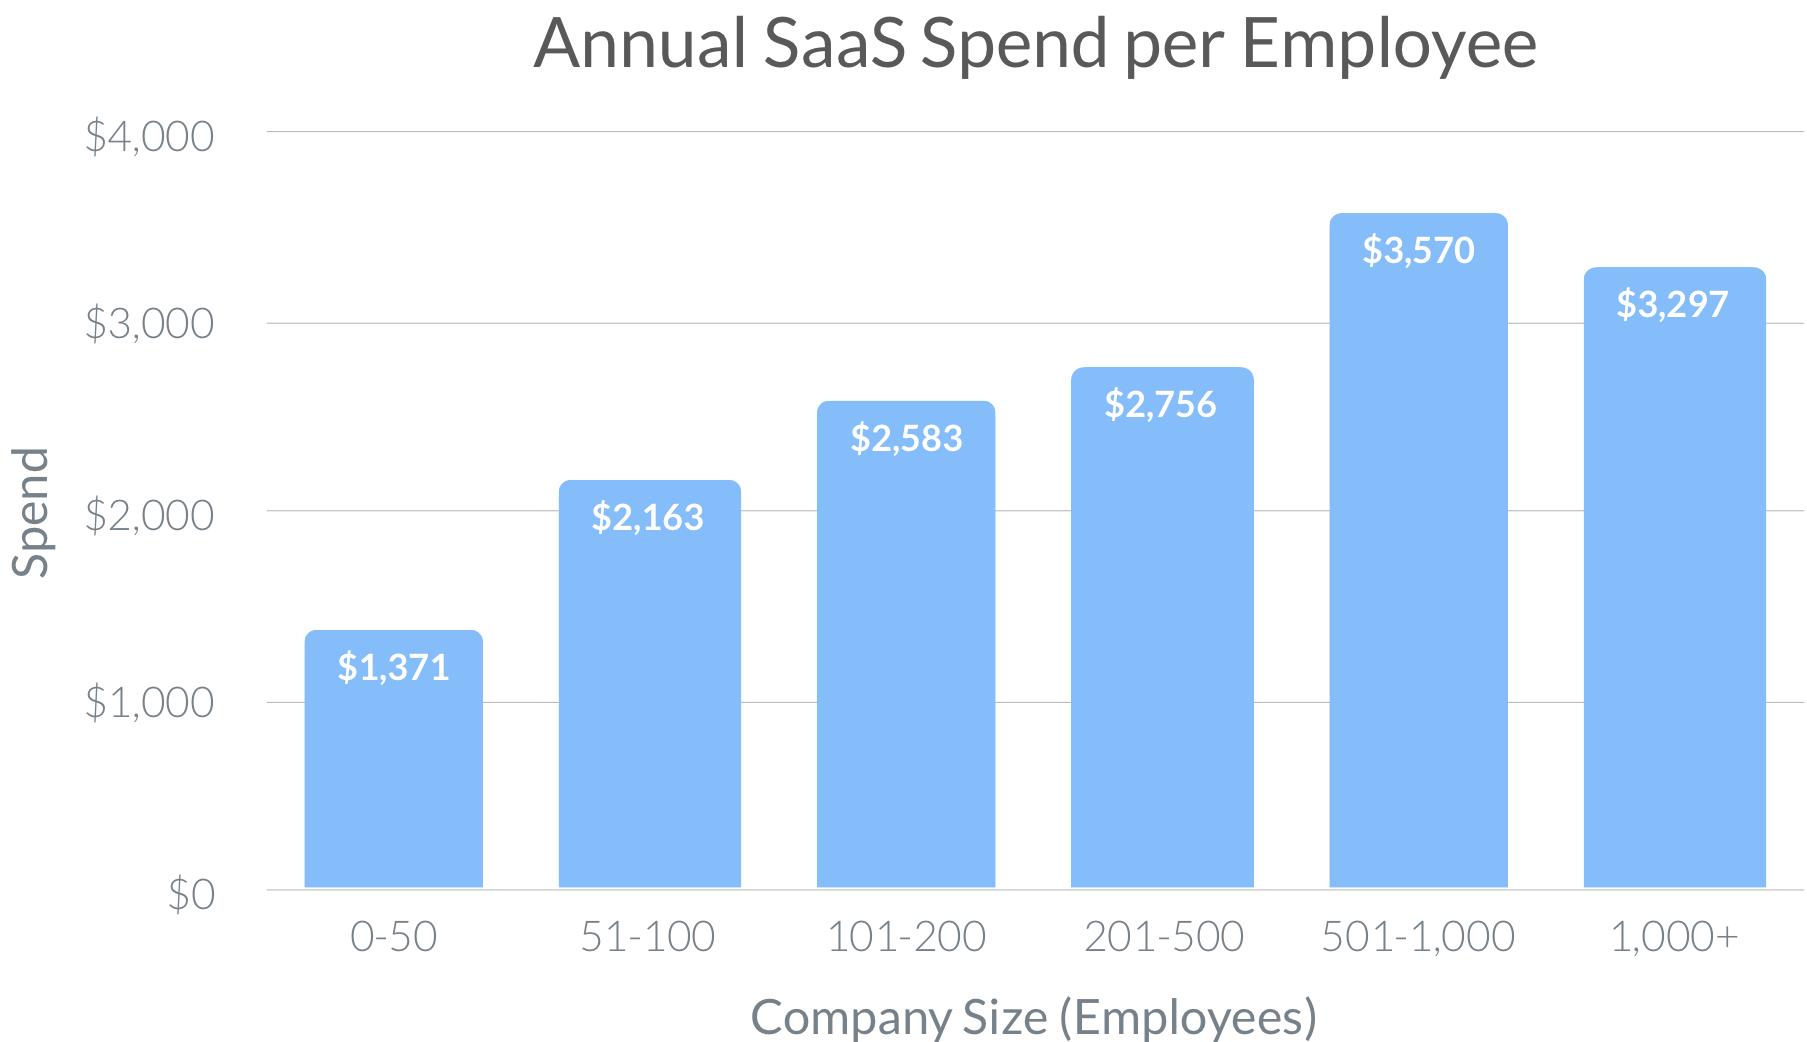 Annual SaaS spend per employee